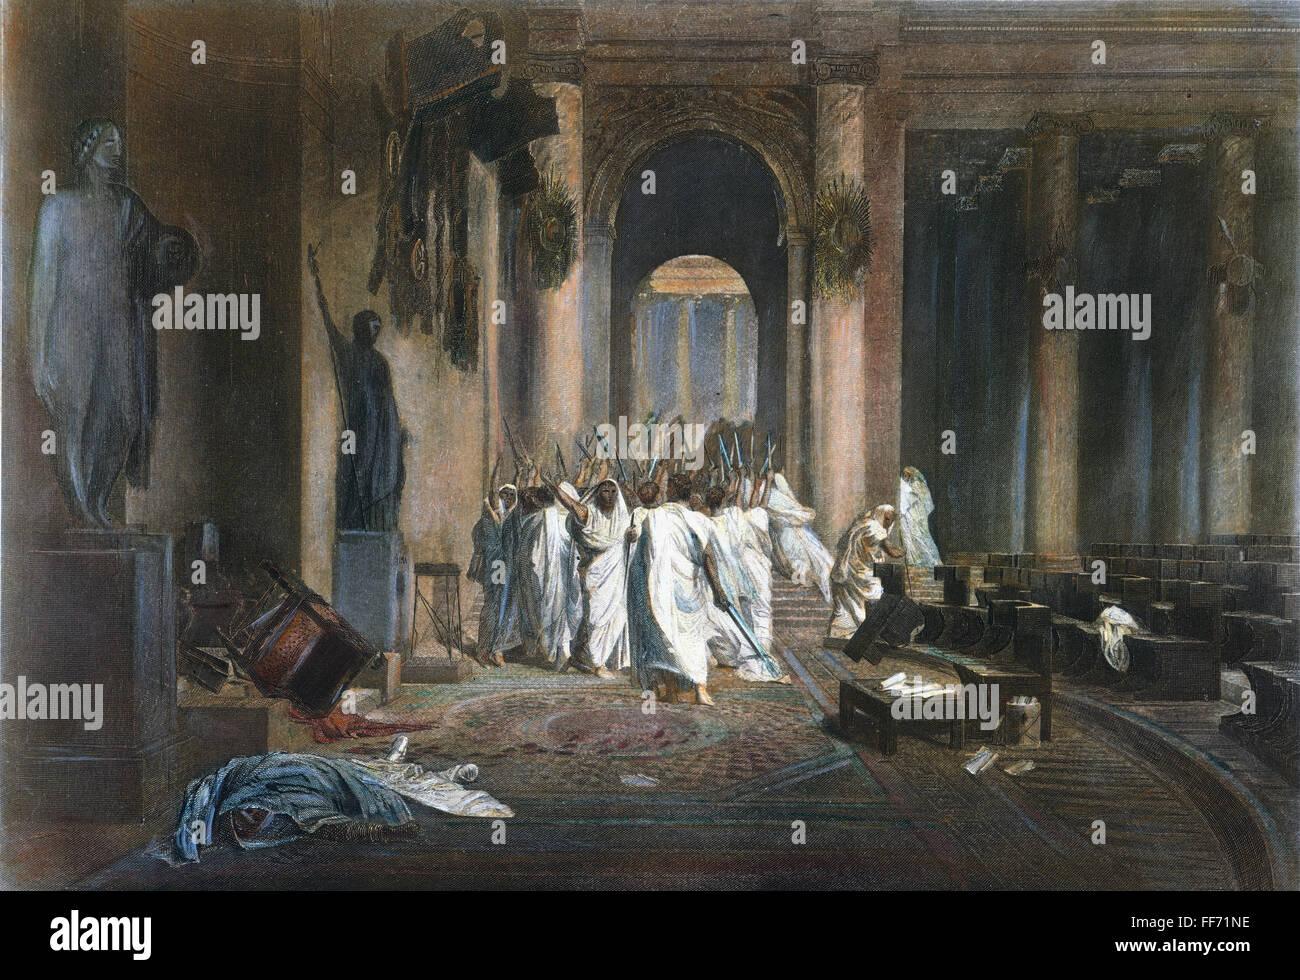 JULIUS CAESAR (100 B.C-44 B.C.). /nRoman general and statesman. The assassination of Julius Caesar in the Roman Stock Photo